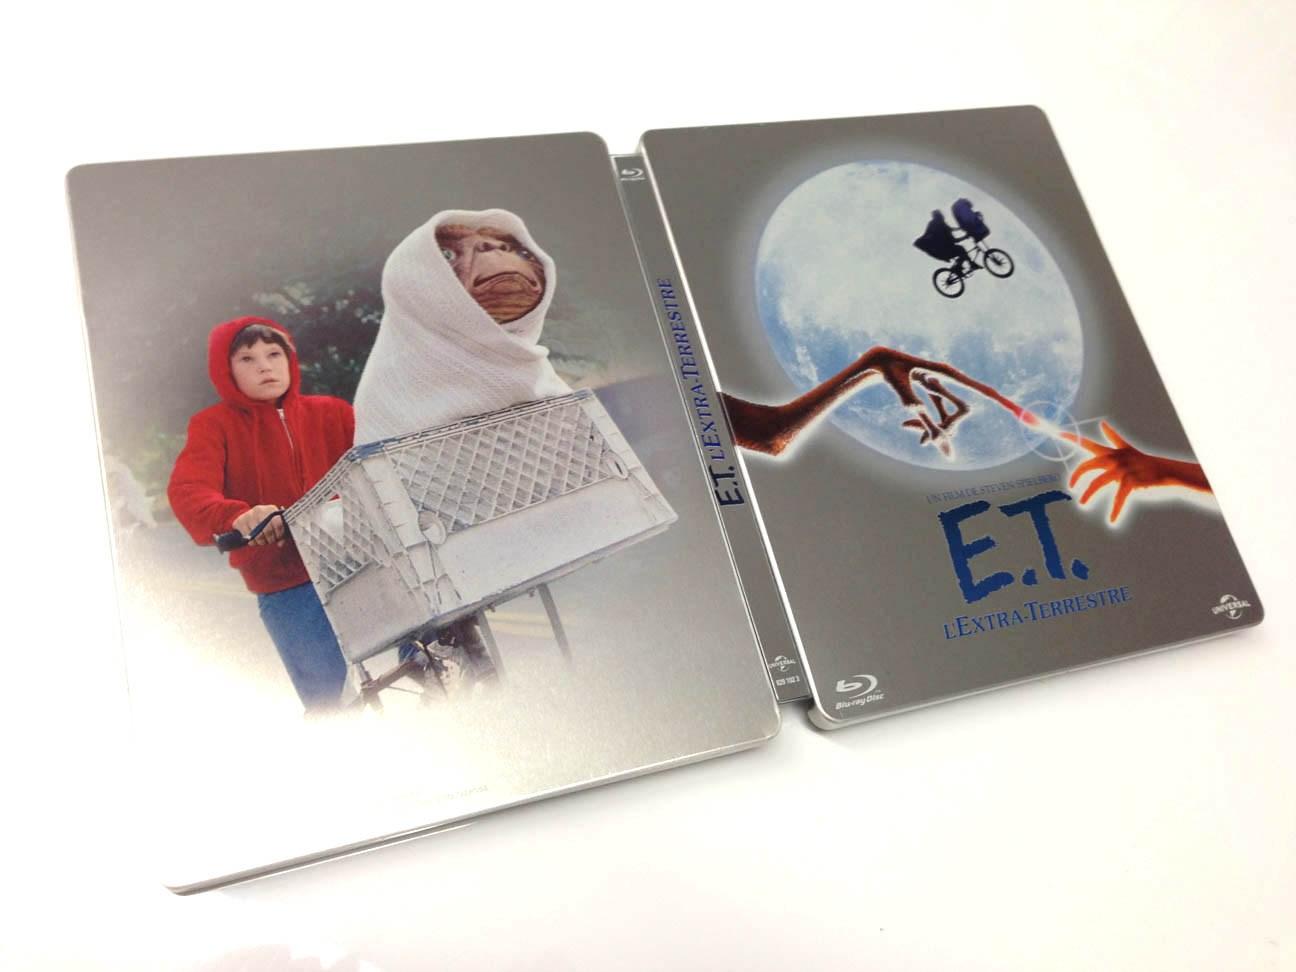 E.T.-lextra-terrestre-édition-limitée-steelbook-6